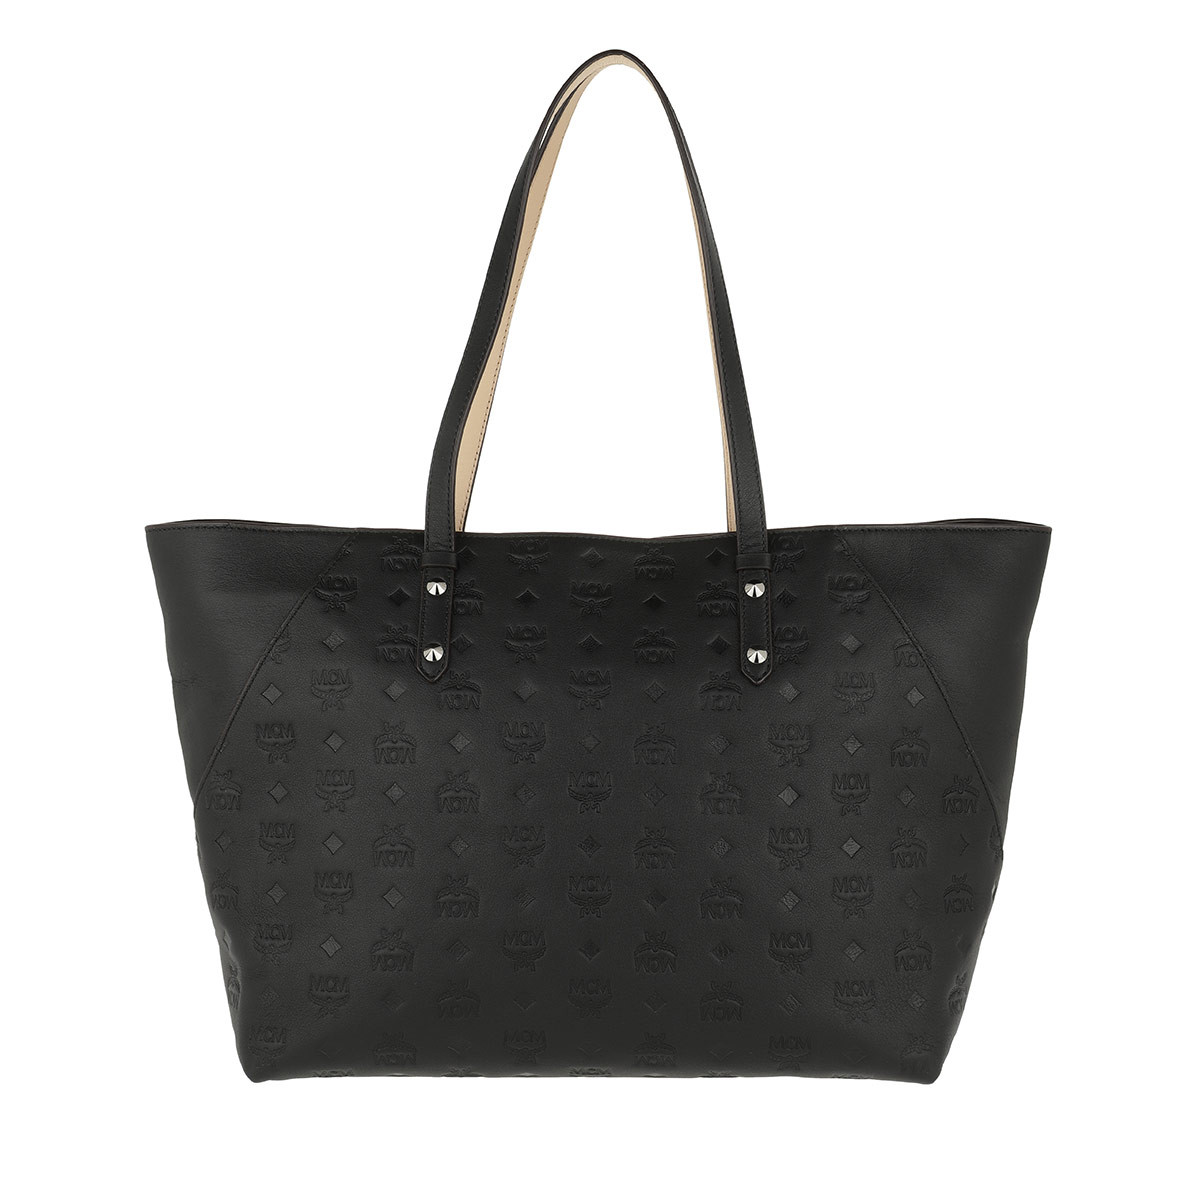 Aigner Tote Roma M Handle Bag Black in schwarz für